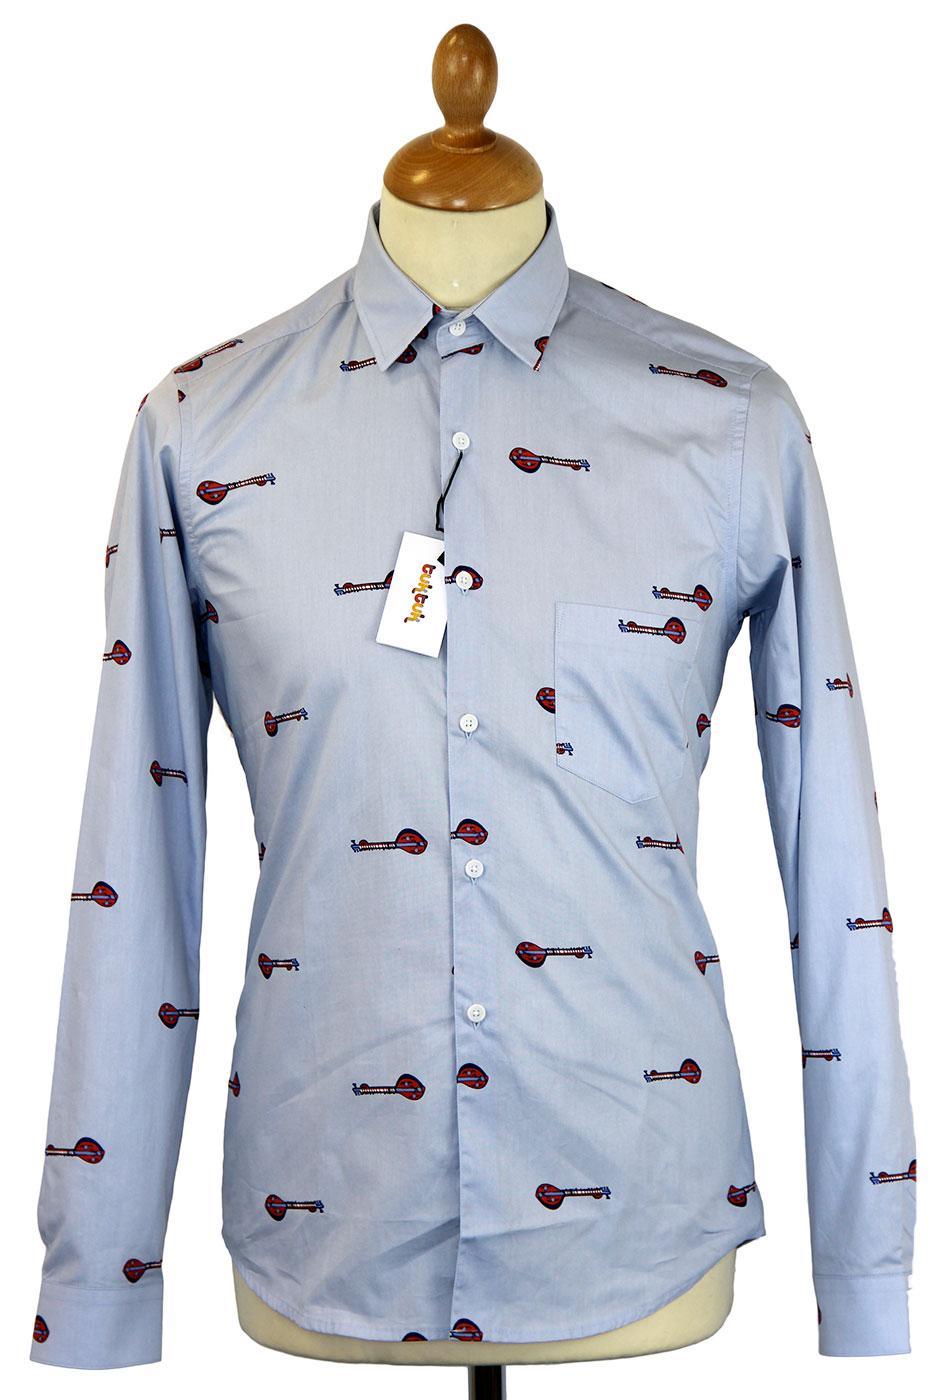 Sitar Print TUKTUK Retro 60s Mod L/S Music Shirt